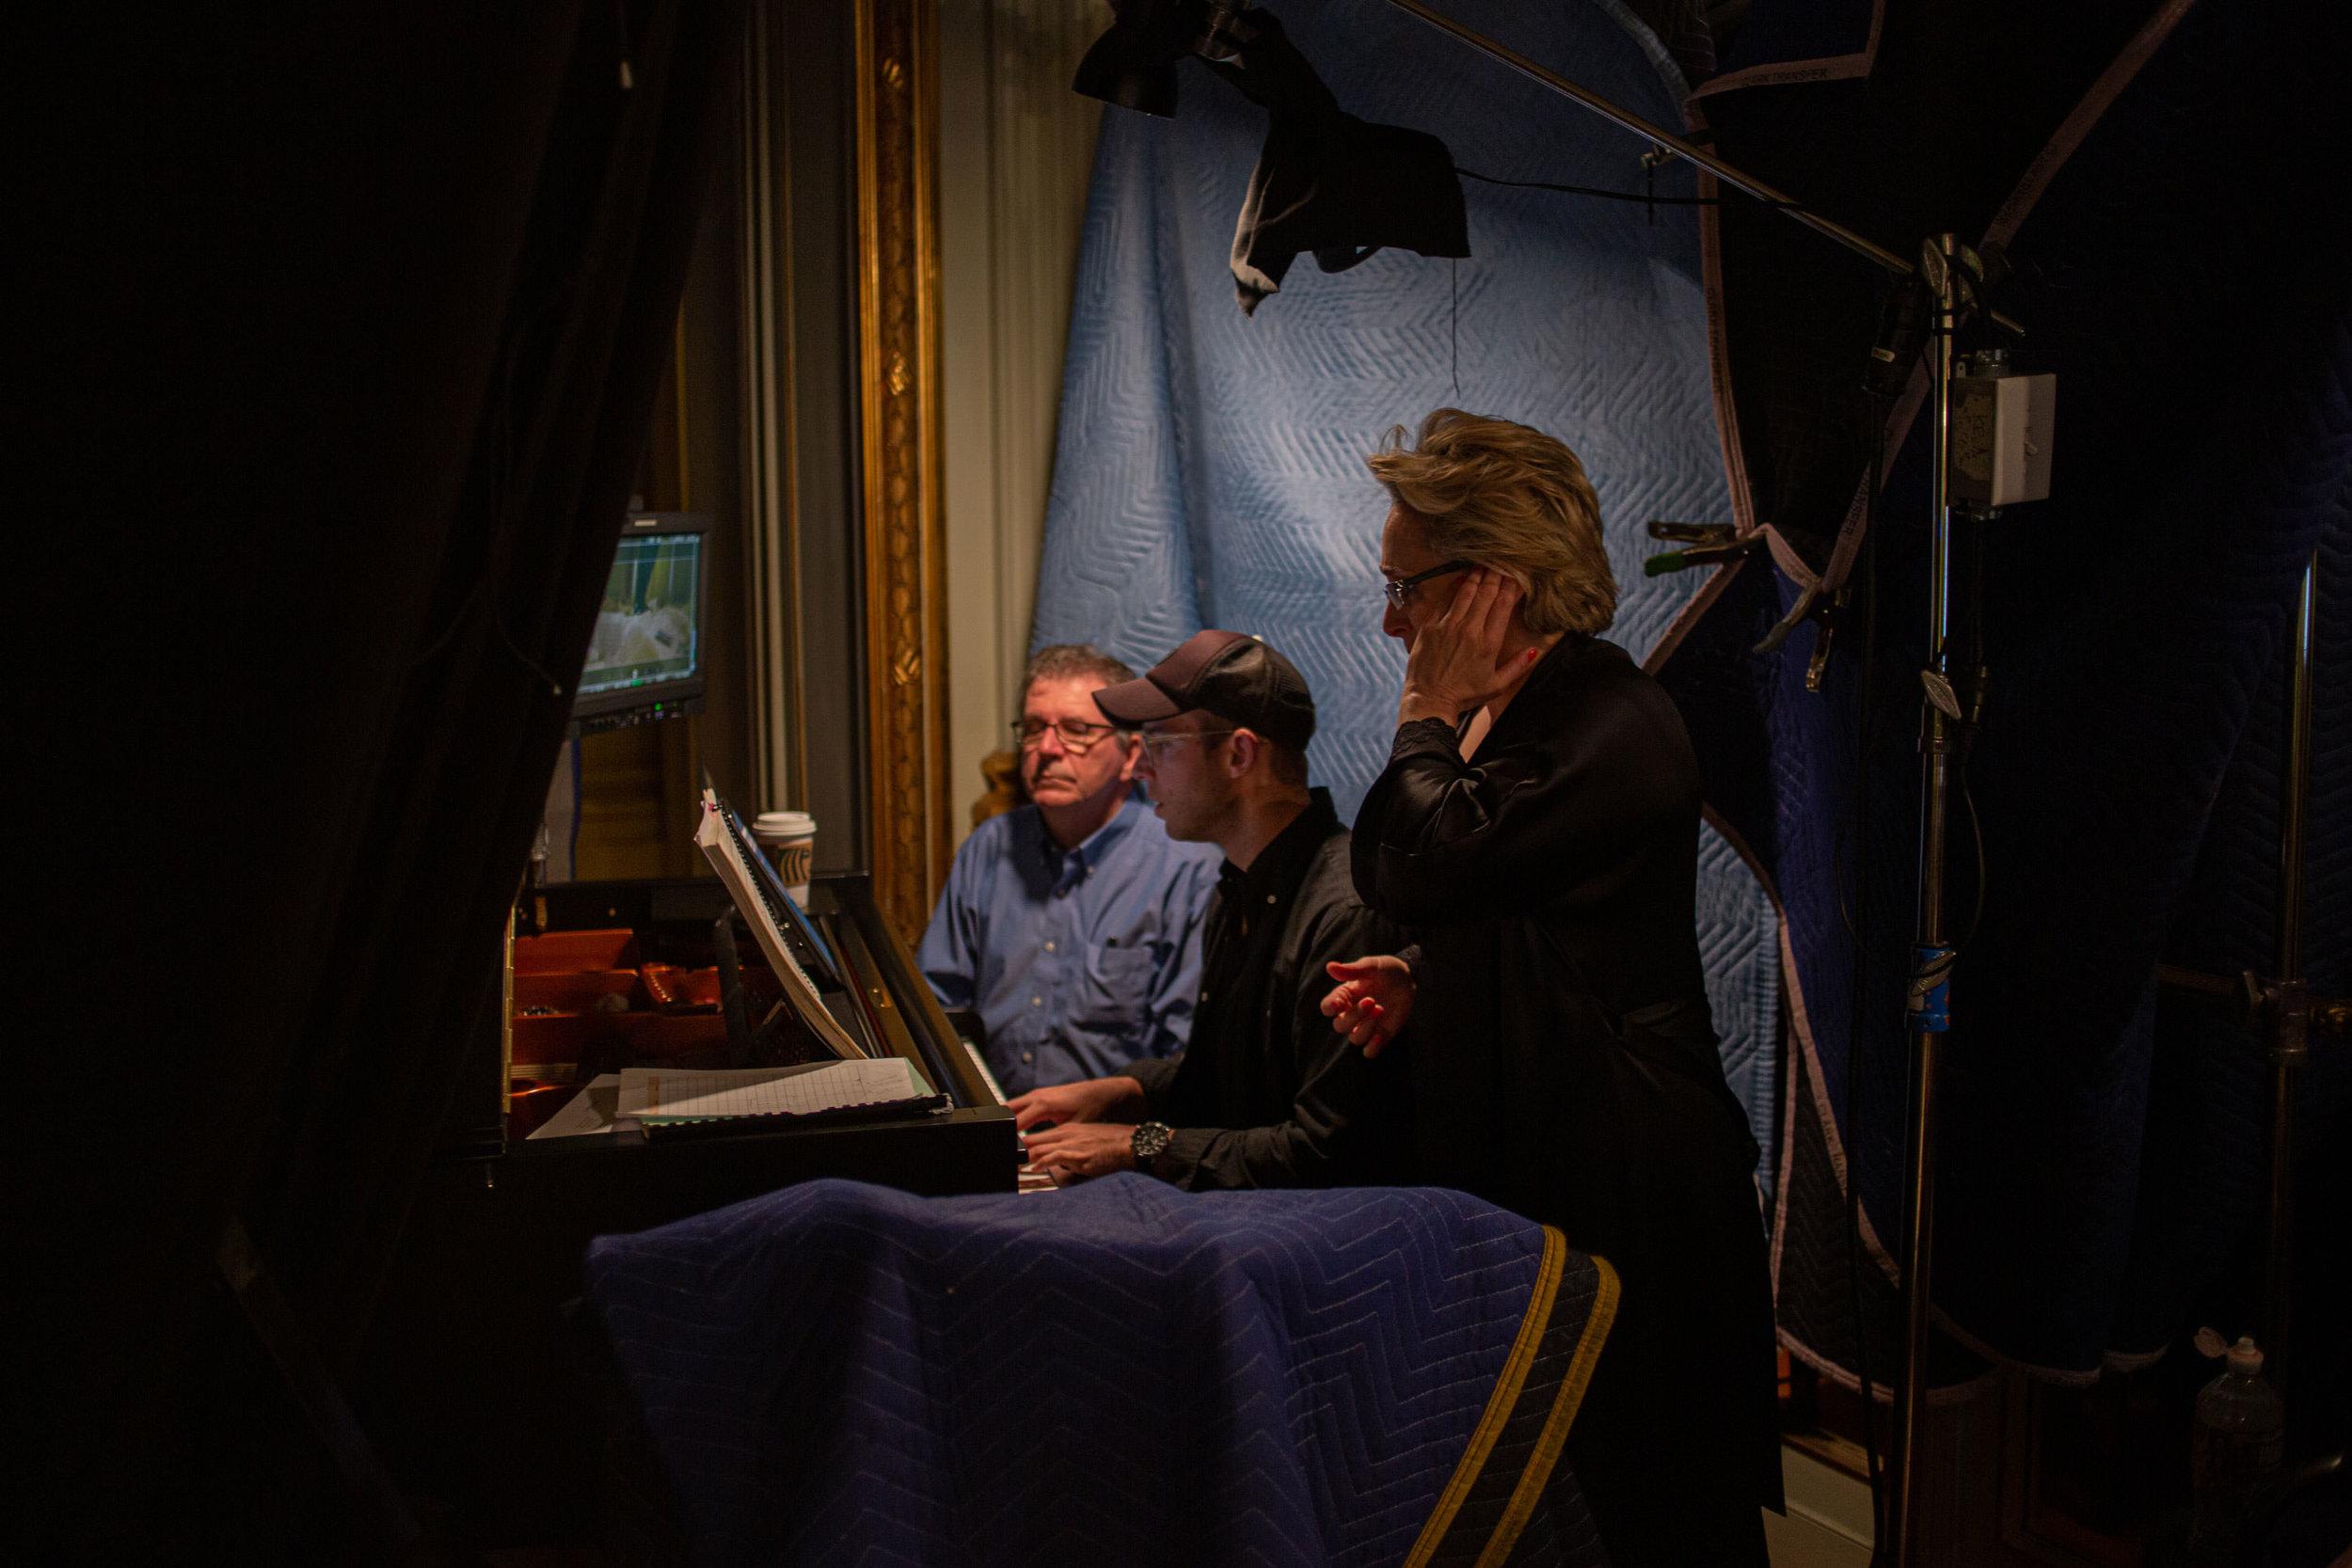 Filming La voix humaine